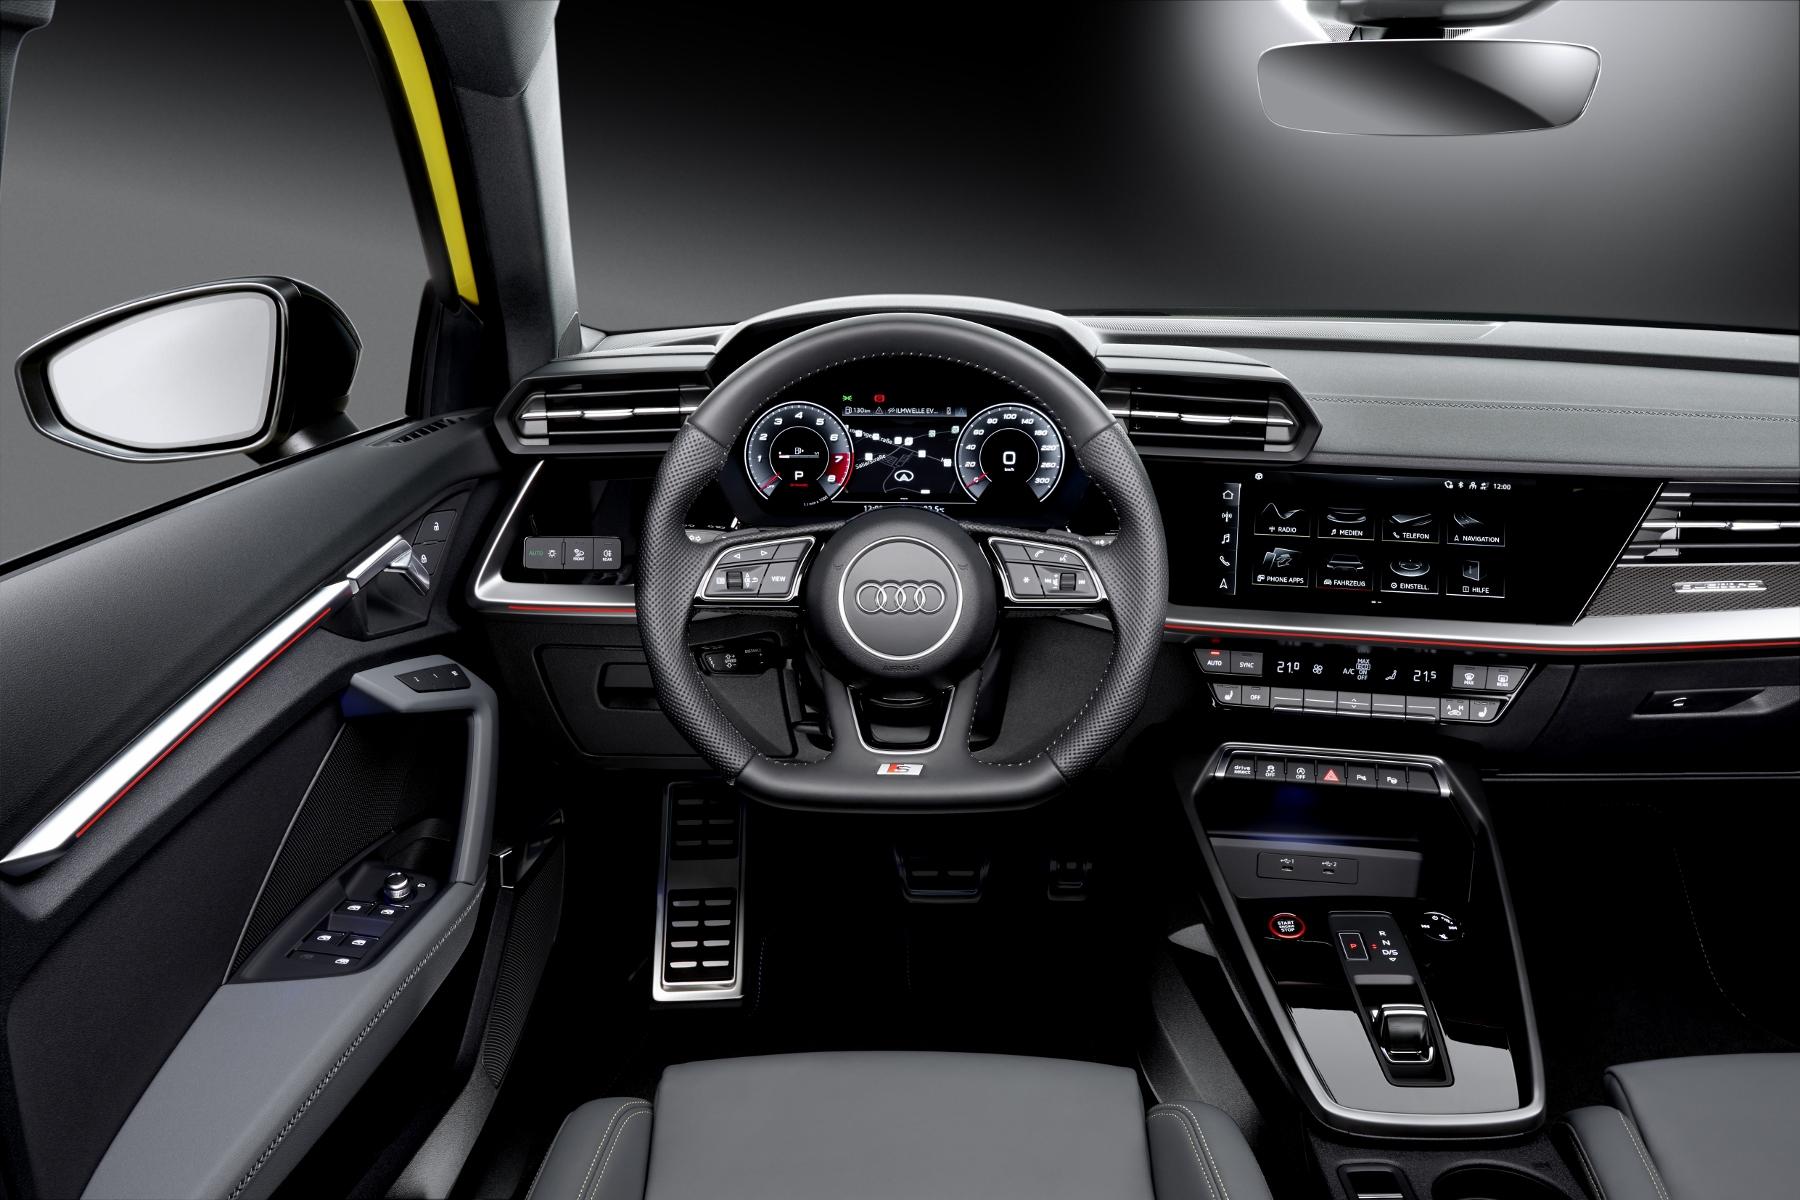 Audi ukázalo modely S3 Sedan a Sportback. Prezradilo aj nemeckú cenu aQIzpEkWB1 a204424large-1800x12